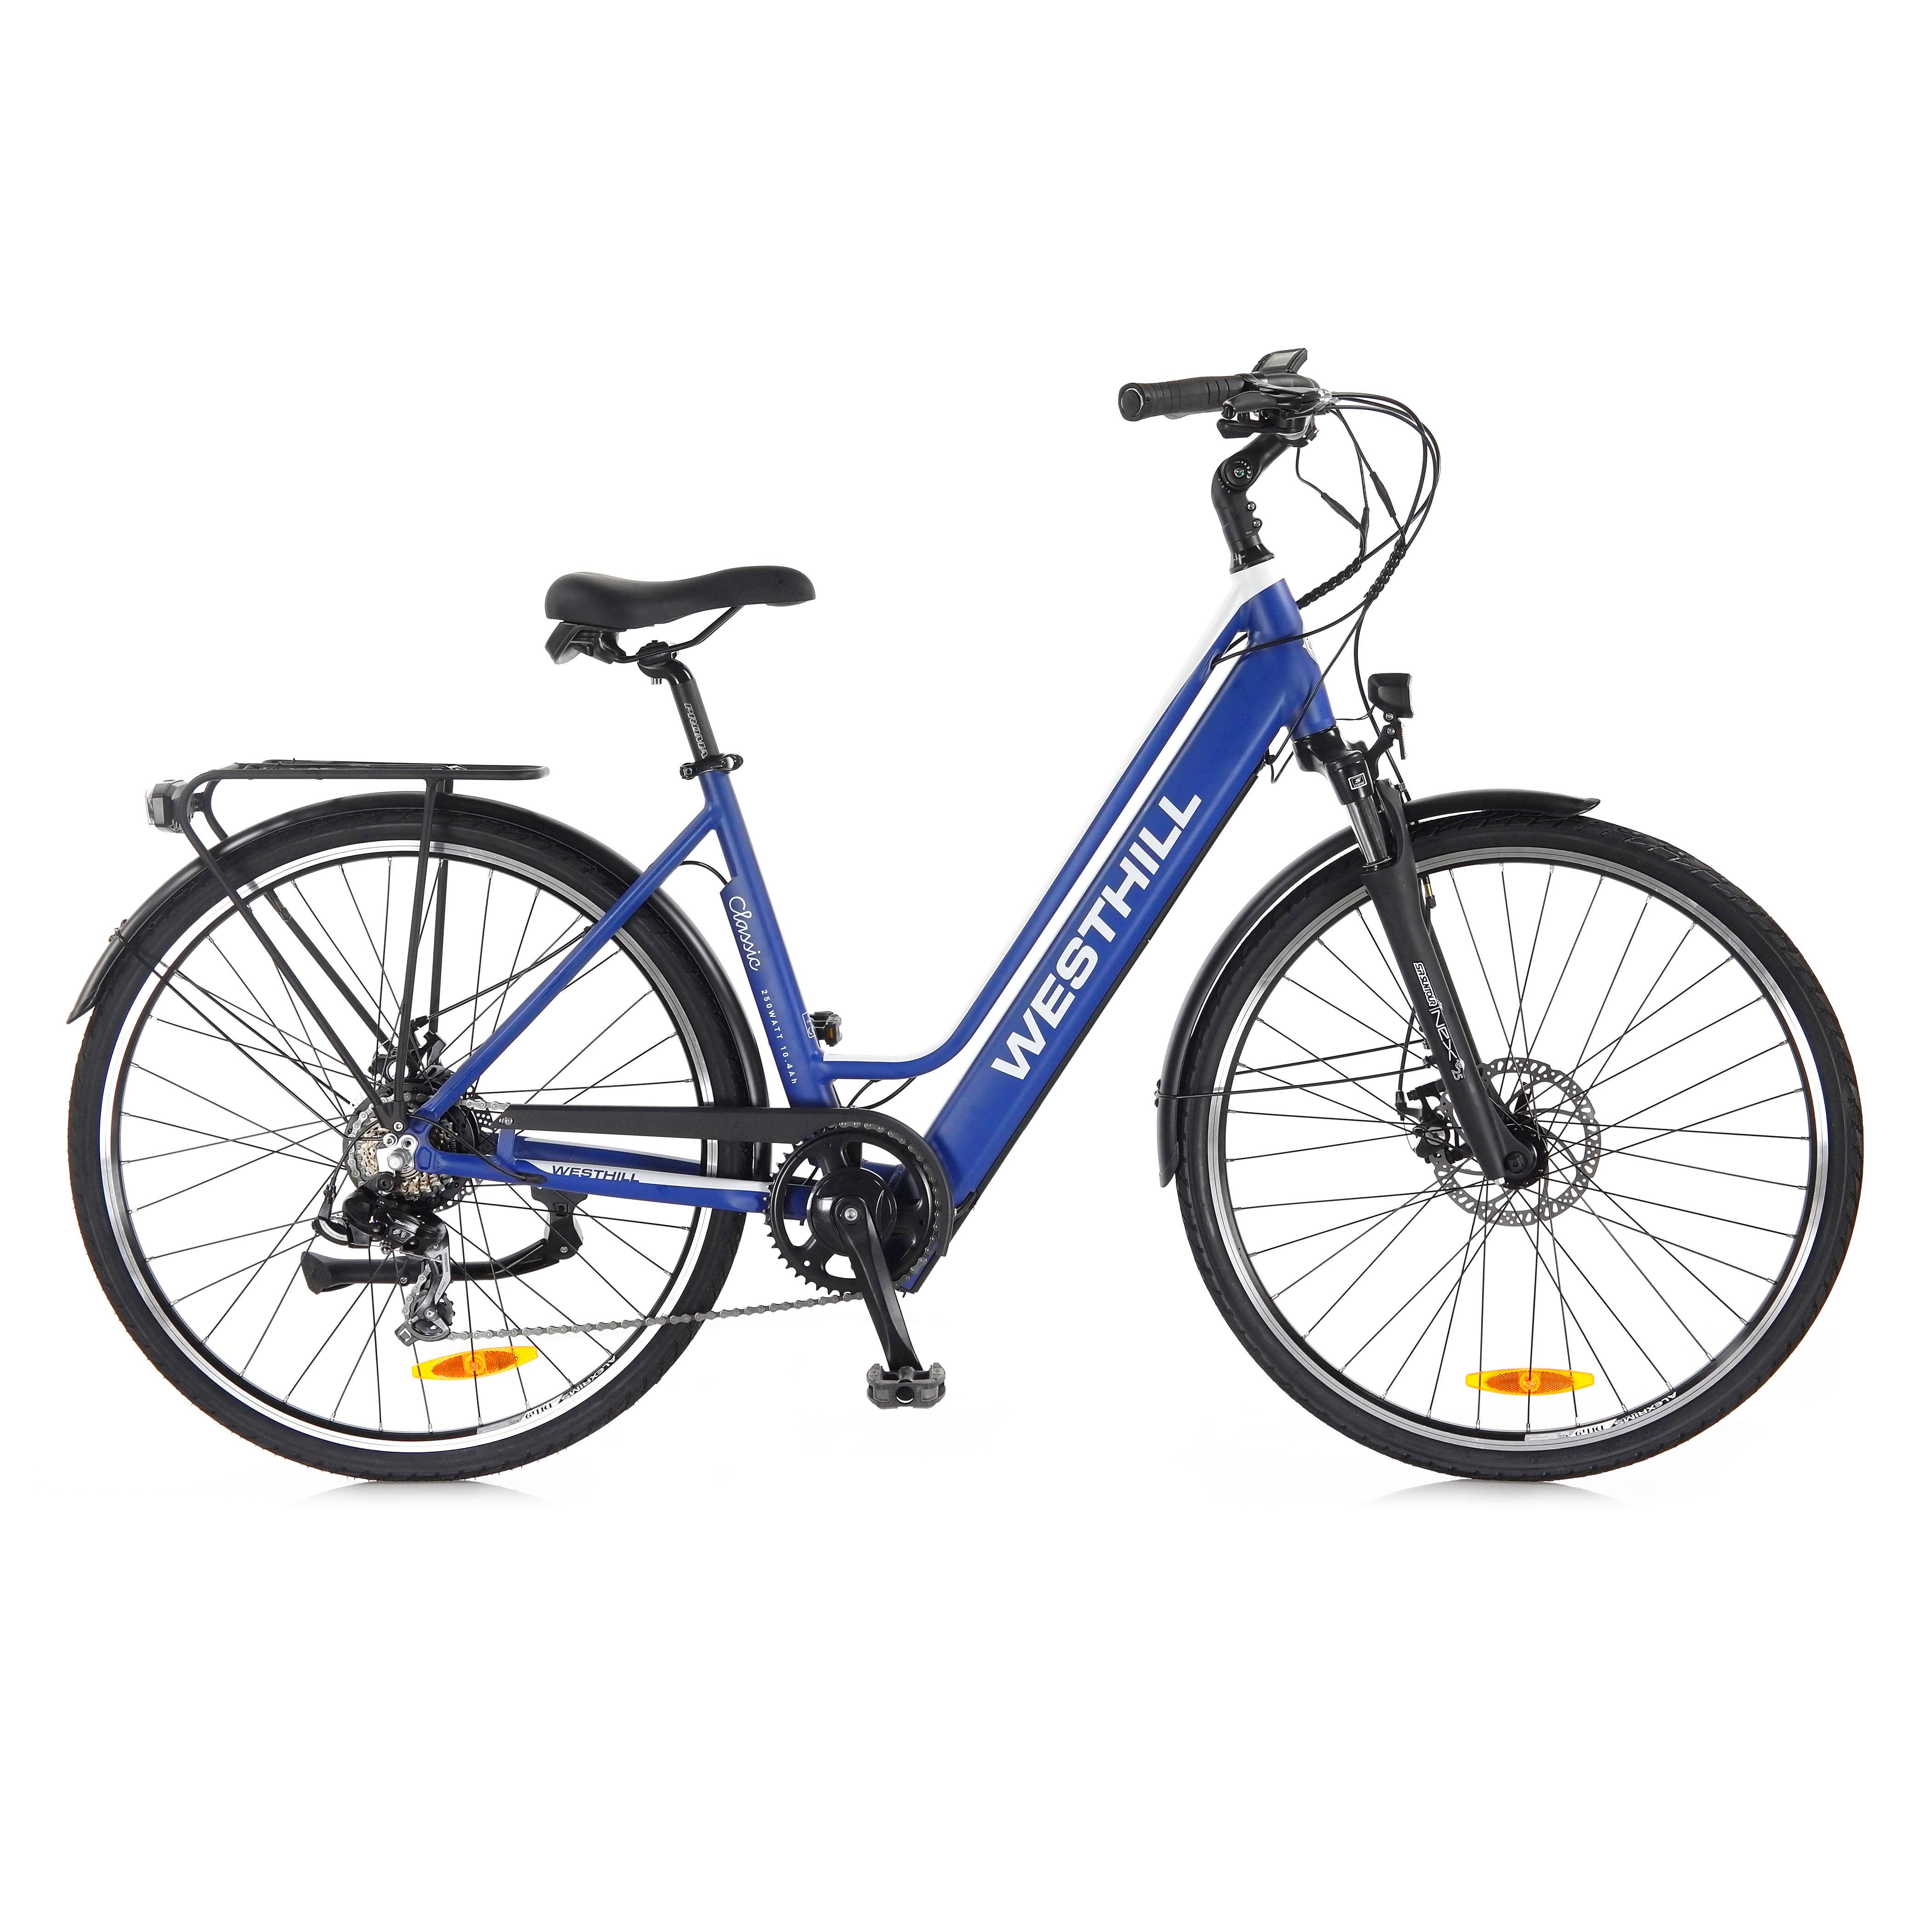 westhill classic blue e-bike